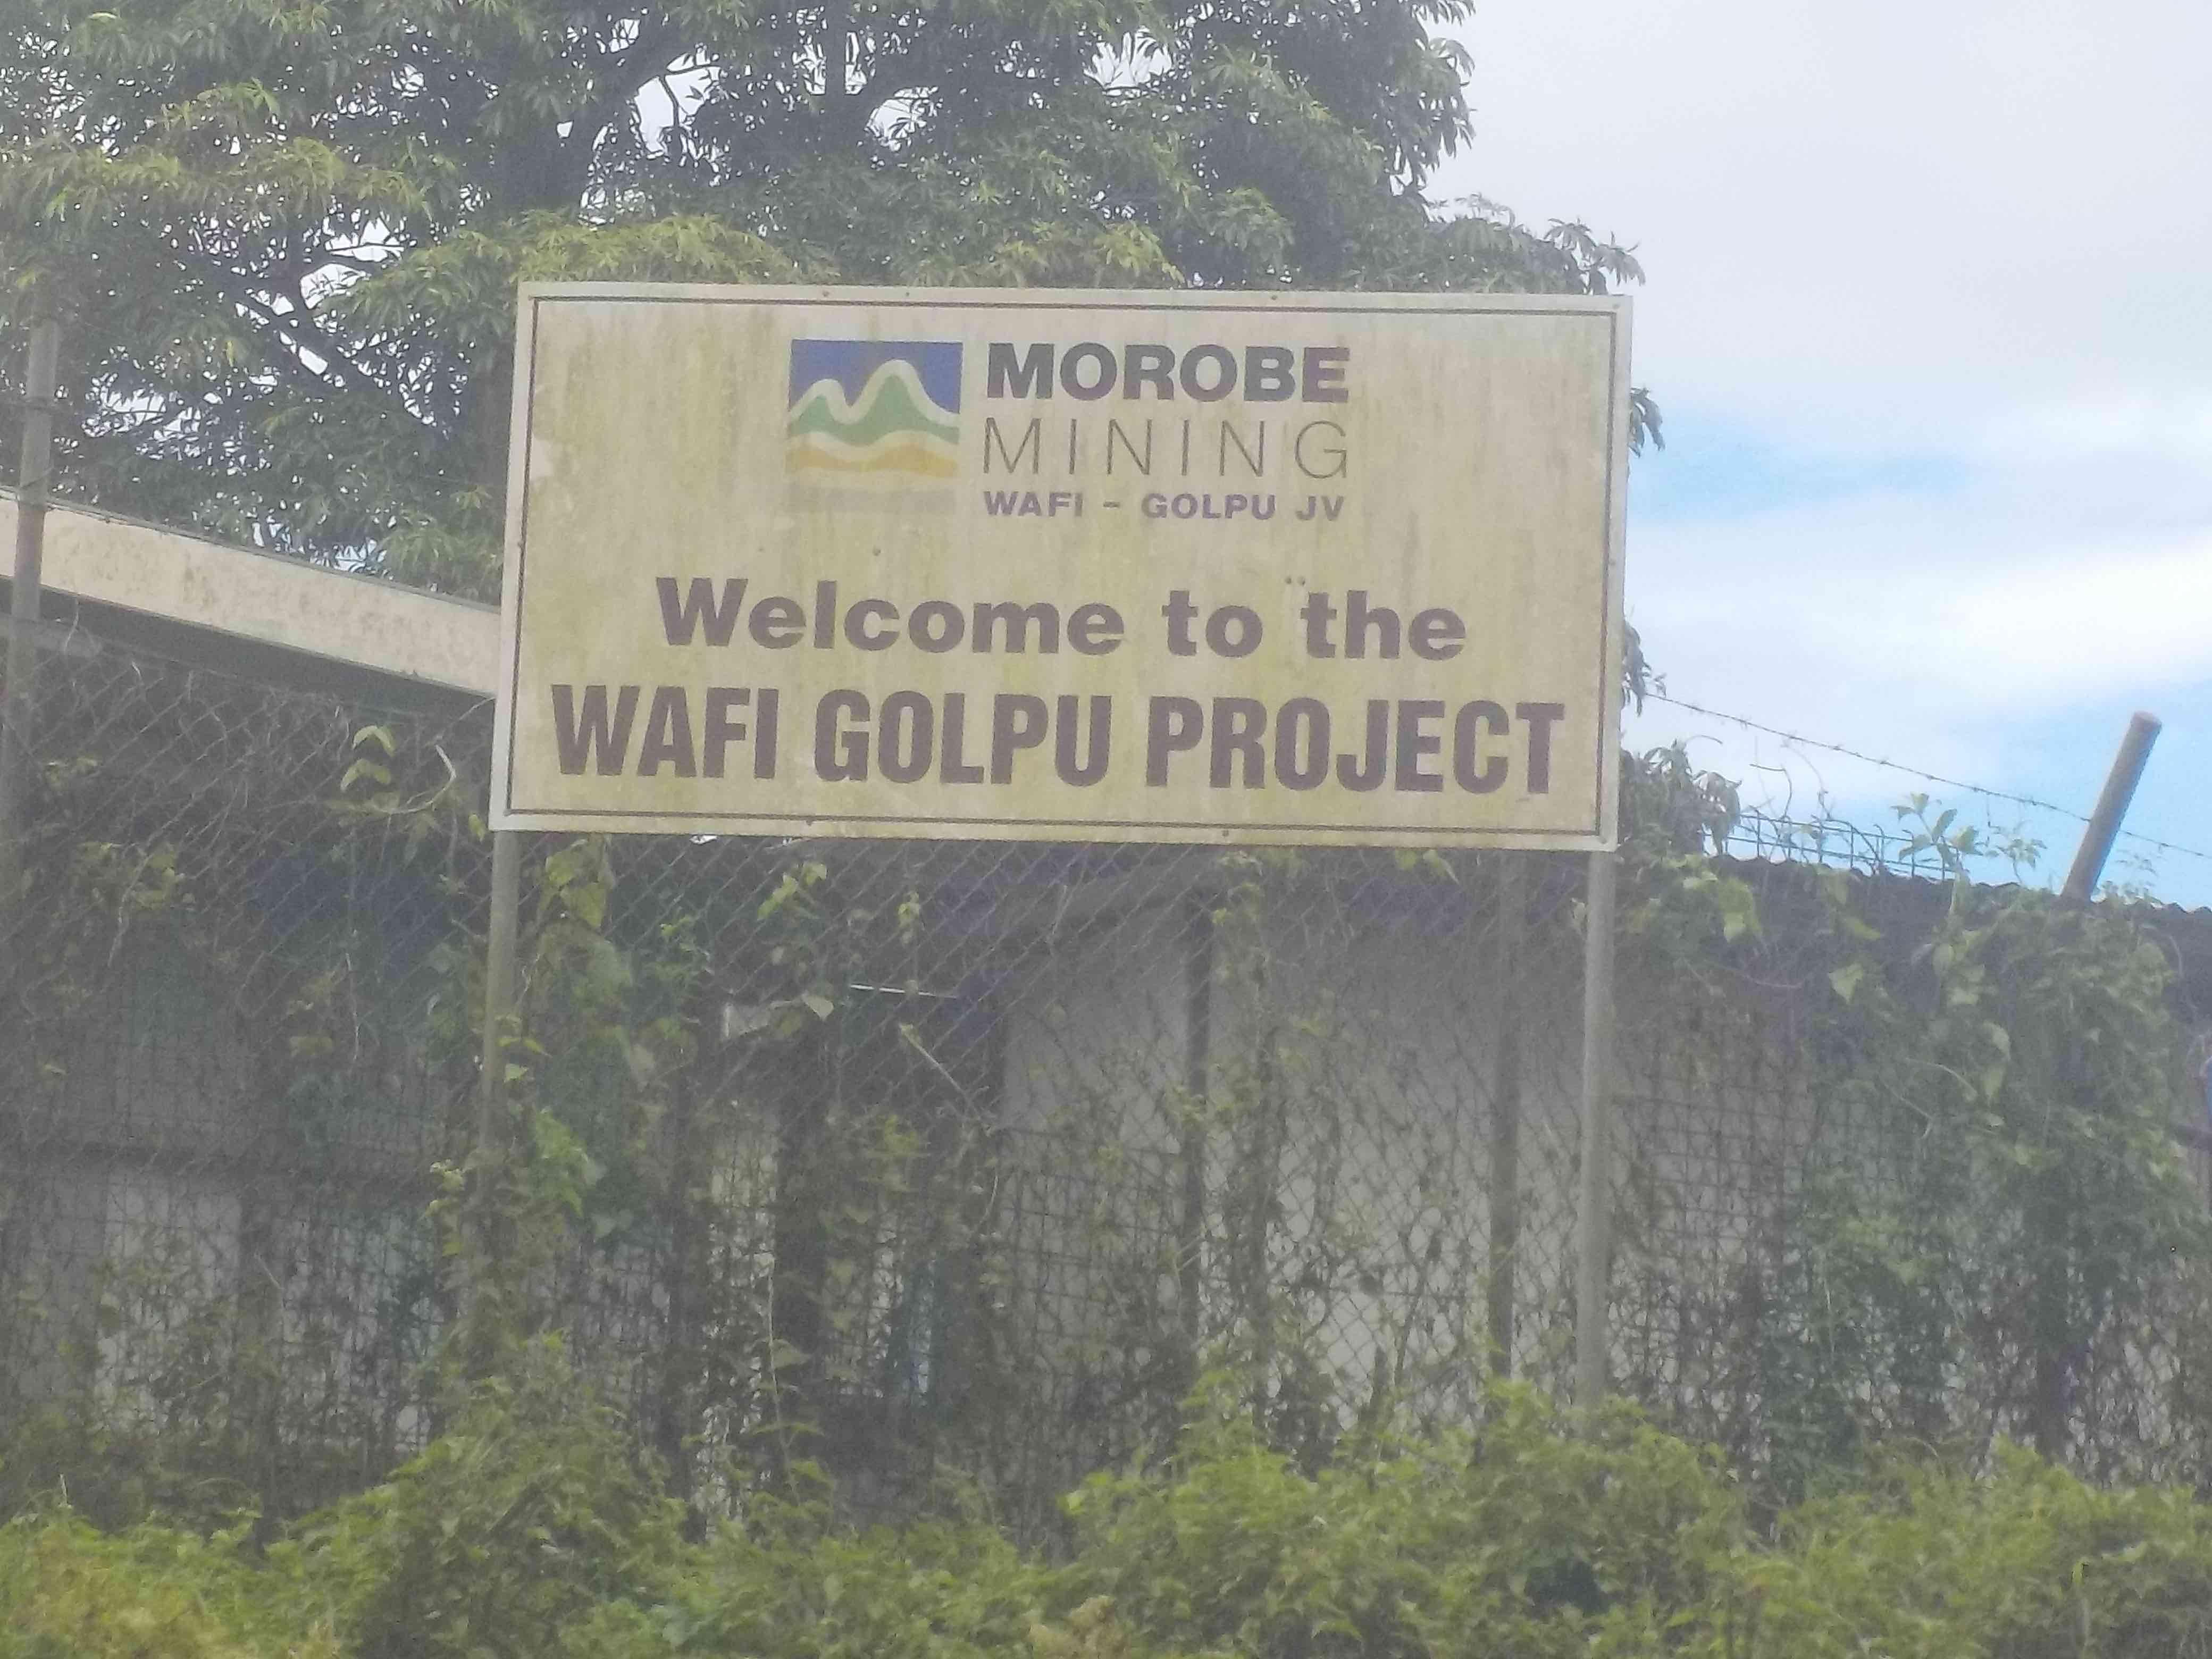 Morobe mining clipart